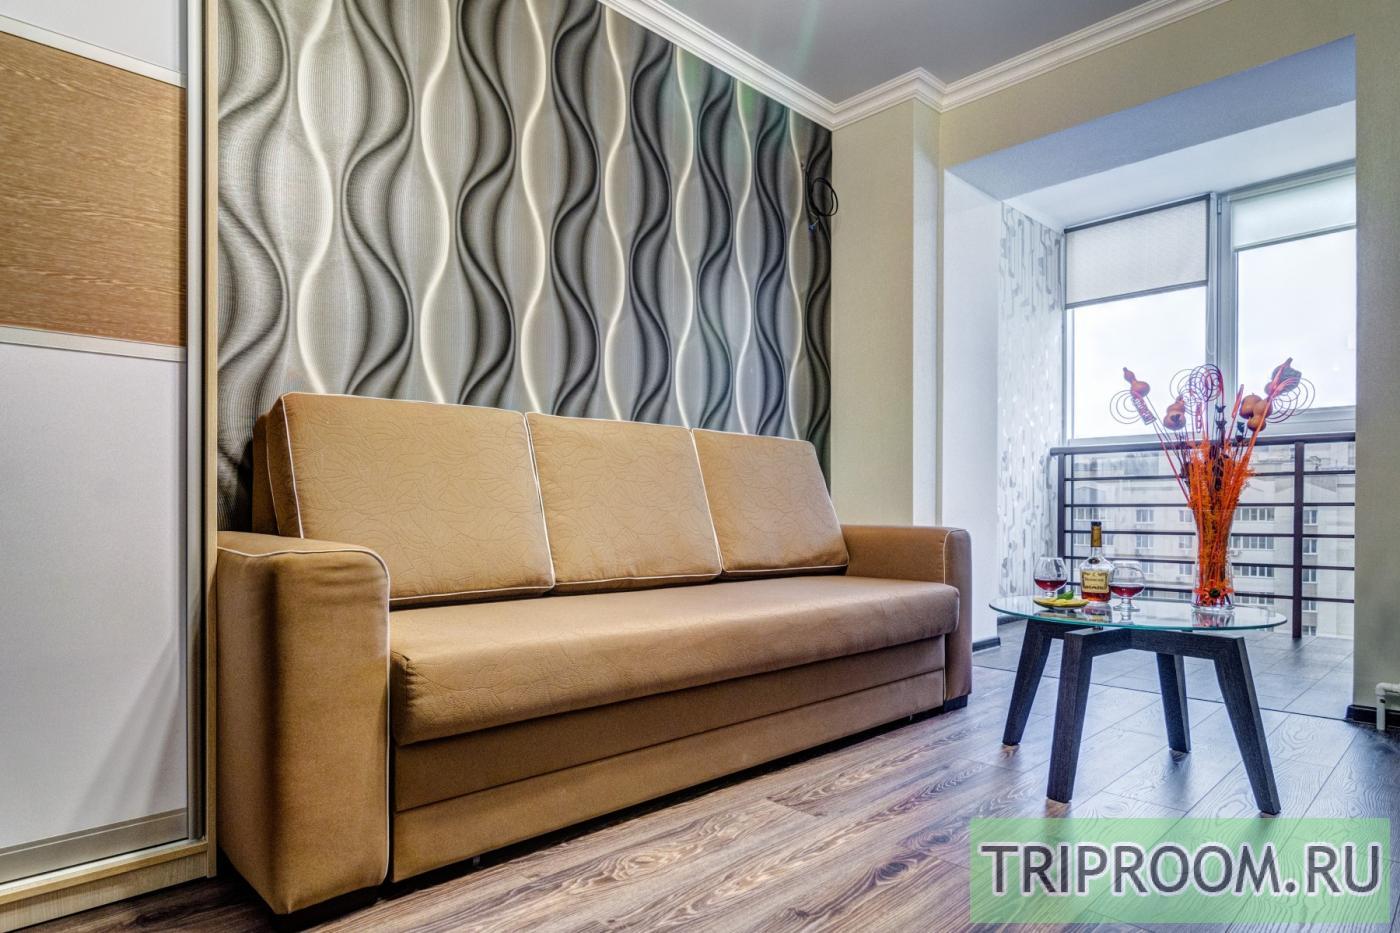 1-комнатная квартира посуточно (вариант № 28442), ул. Суворова улица, фото № 1